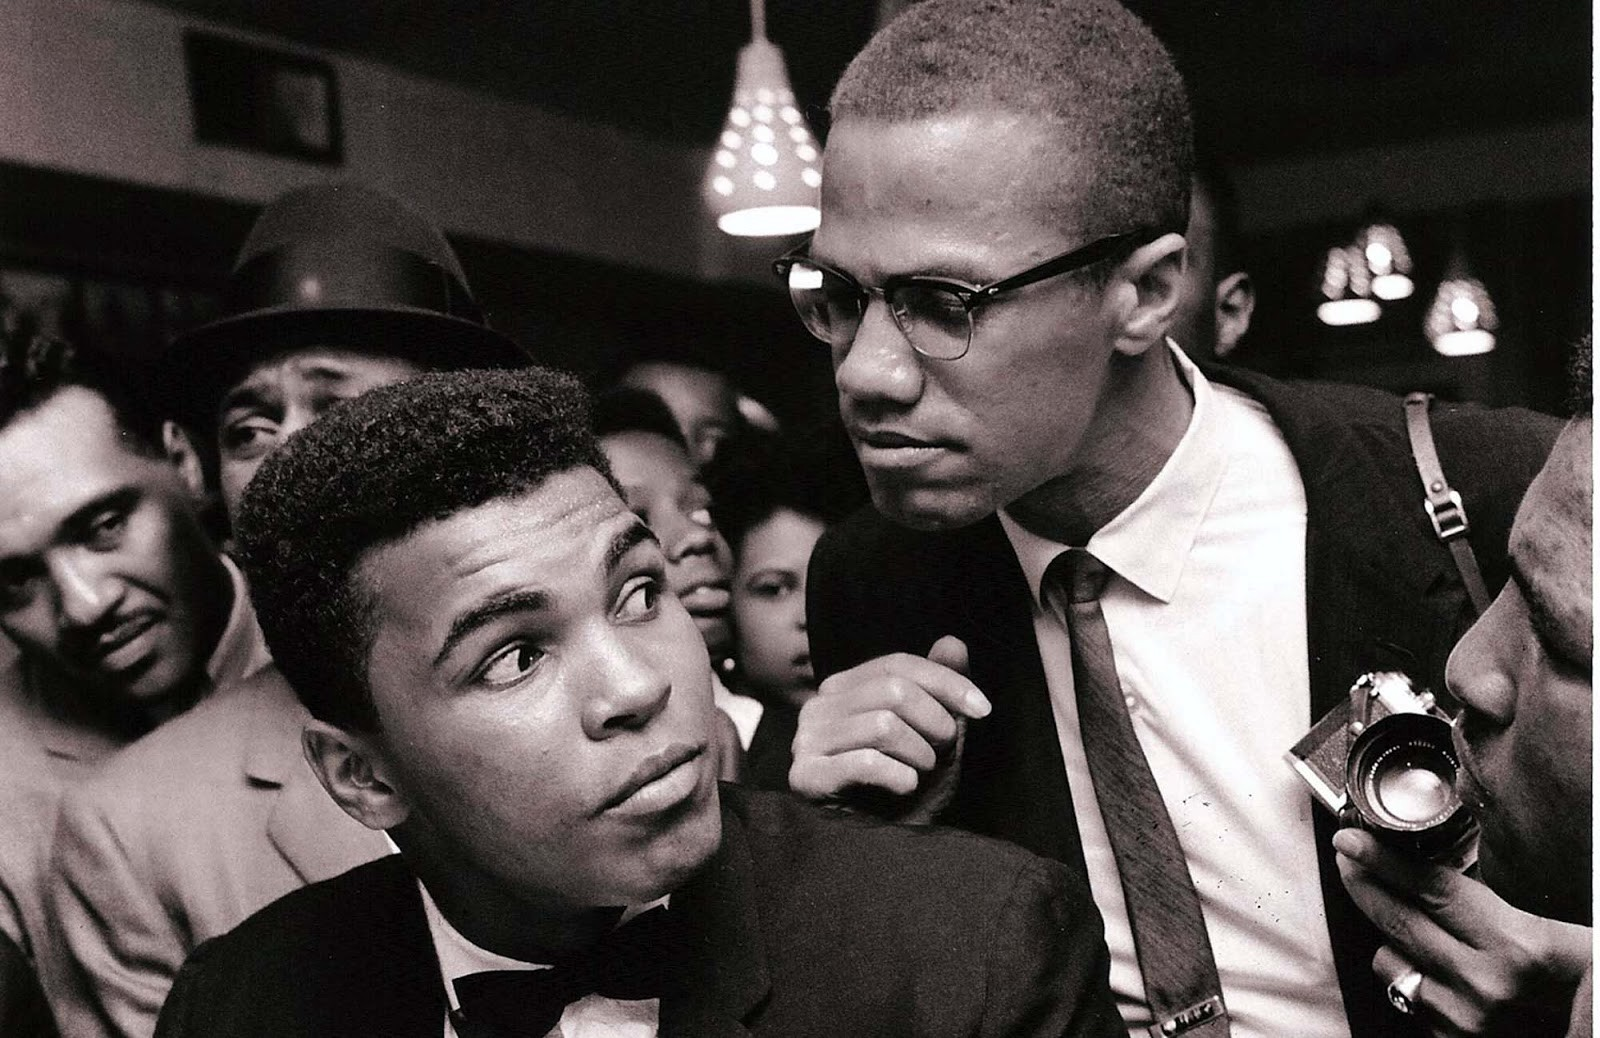 Muhammad Ali and Malcolm X in New York City, 1963. Photo by Bob Gomel.